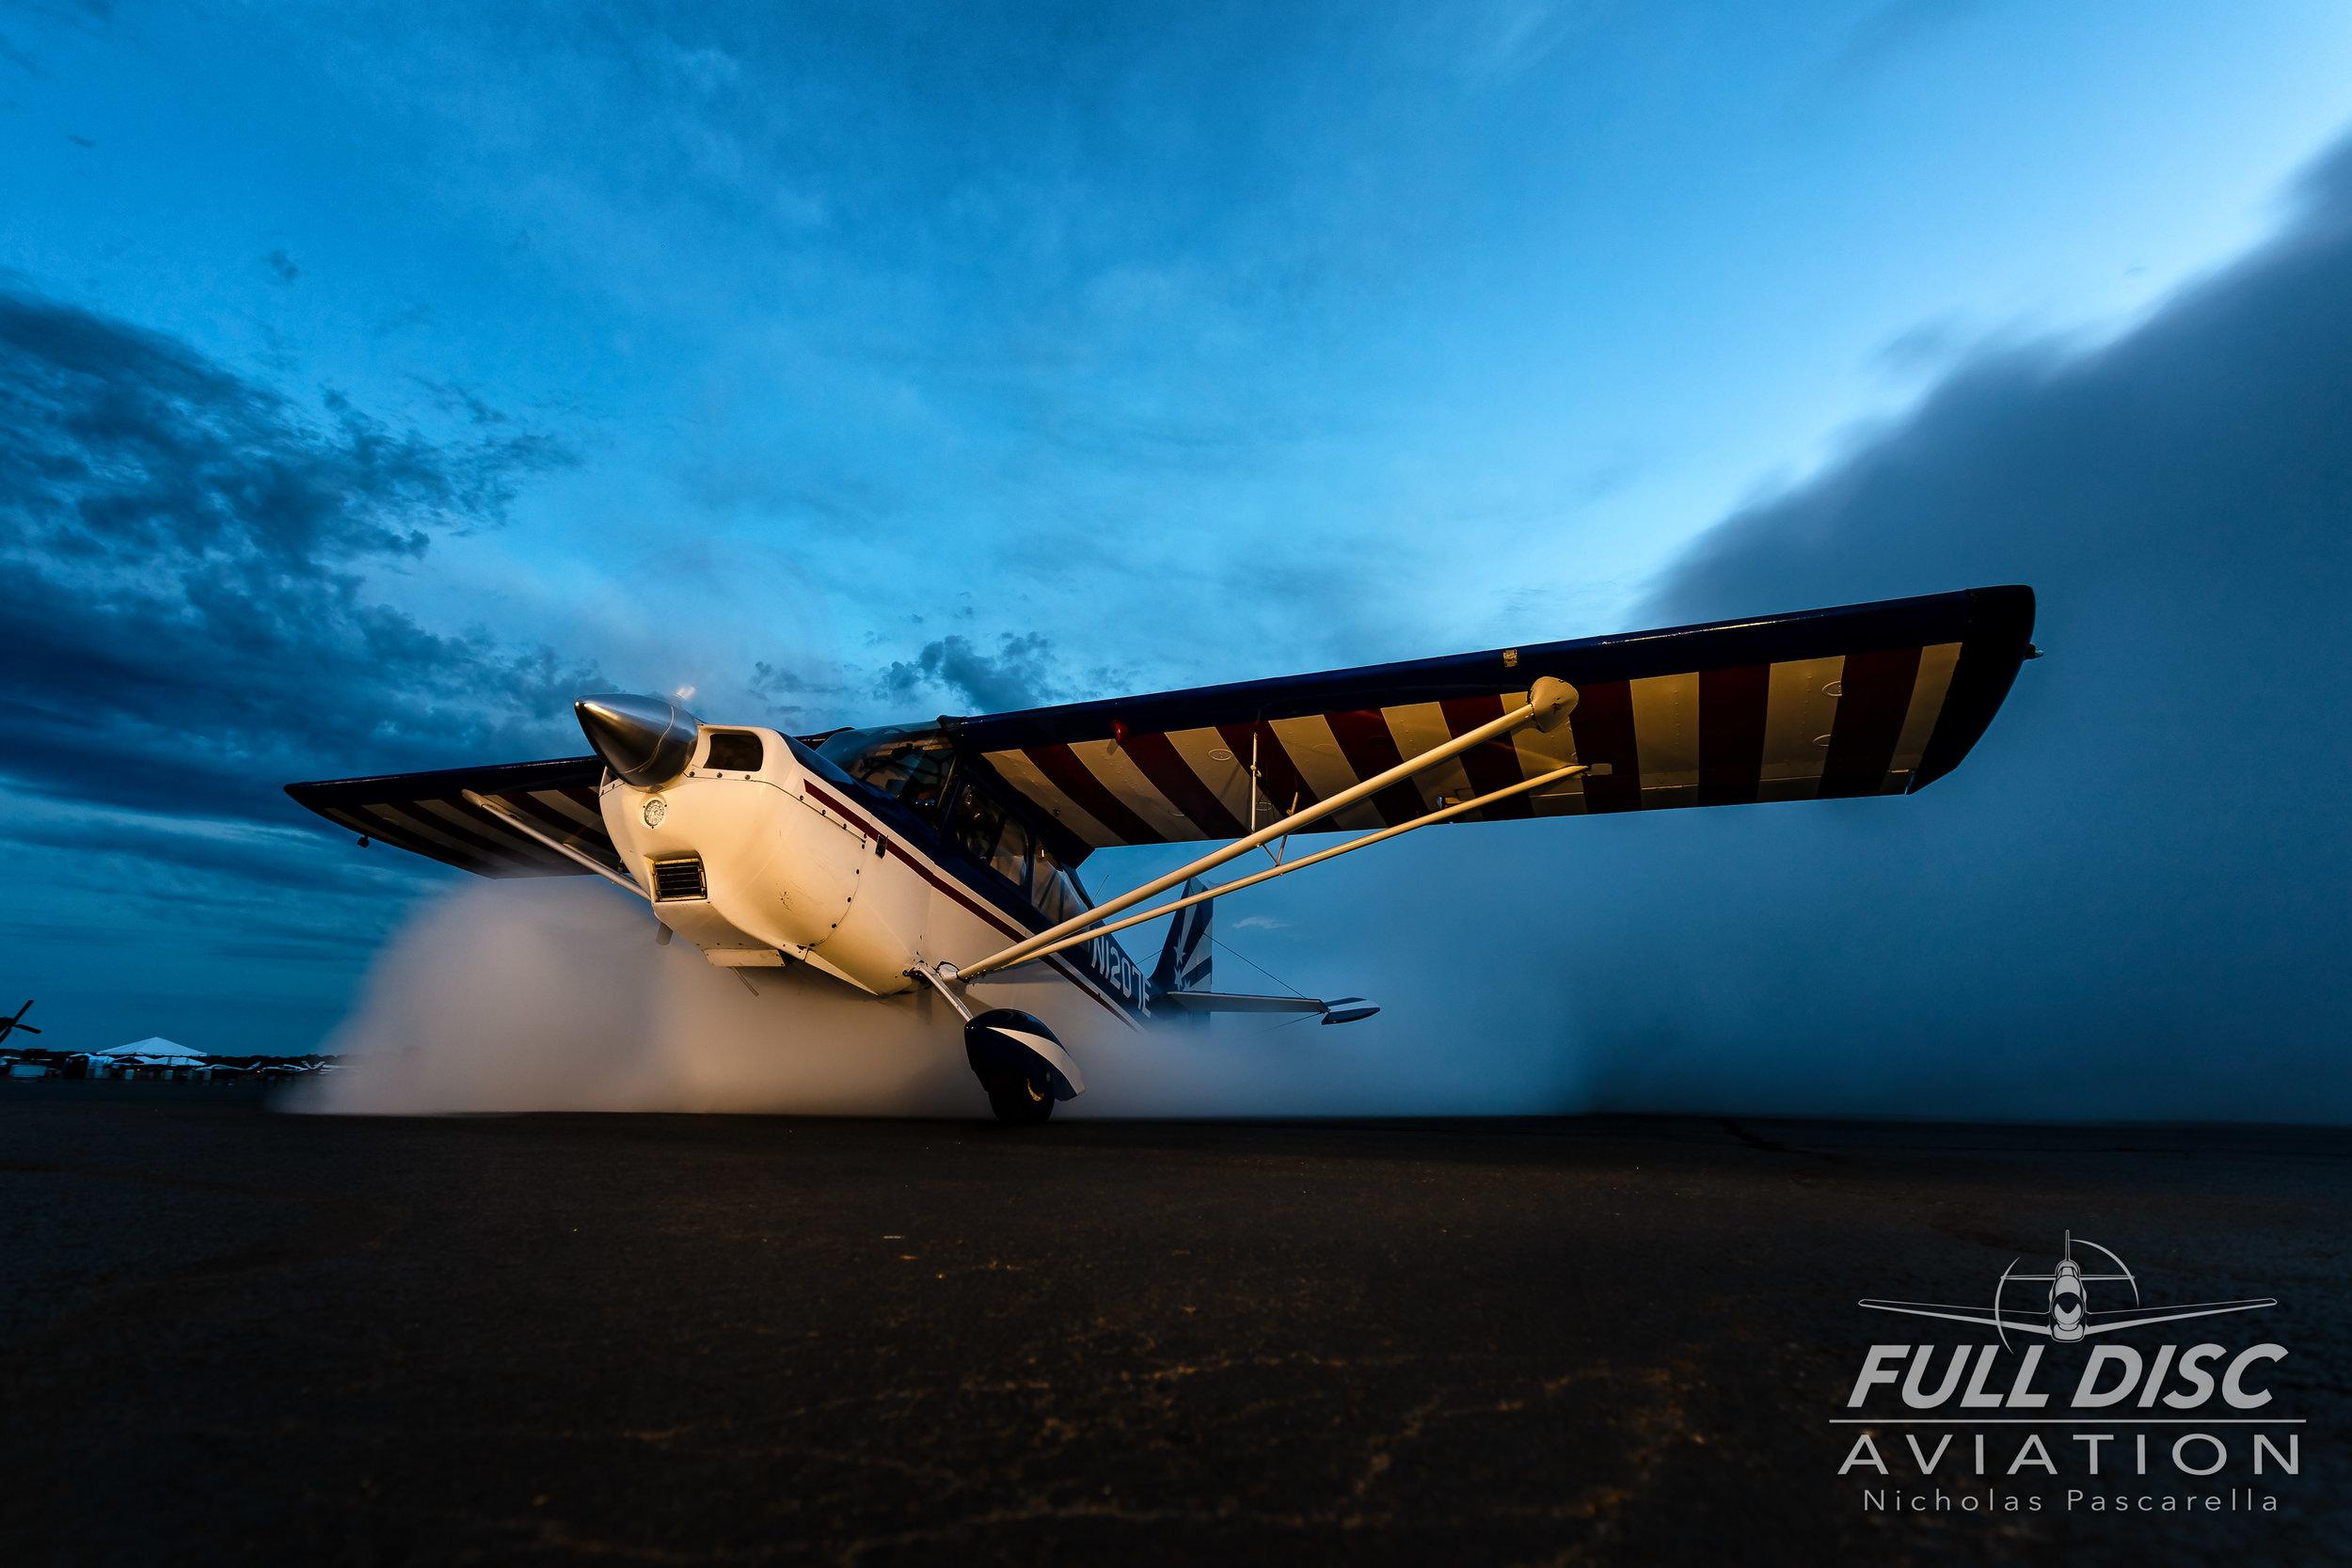 rjgritter_smokeshow_rjgritter_decathalon_pilot_portrait_nightshoot__aviation__nickpascarella_nicholaspascarella_fulldiscaviation_leasewebmanassasairshow.jpg.jpg